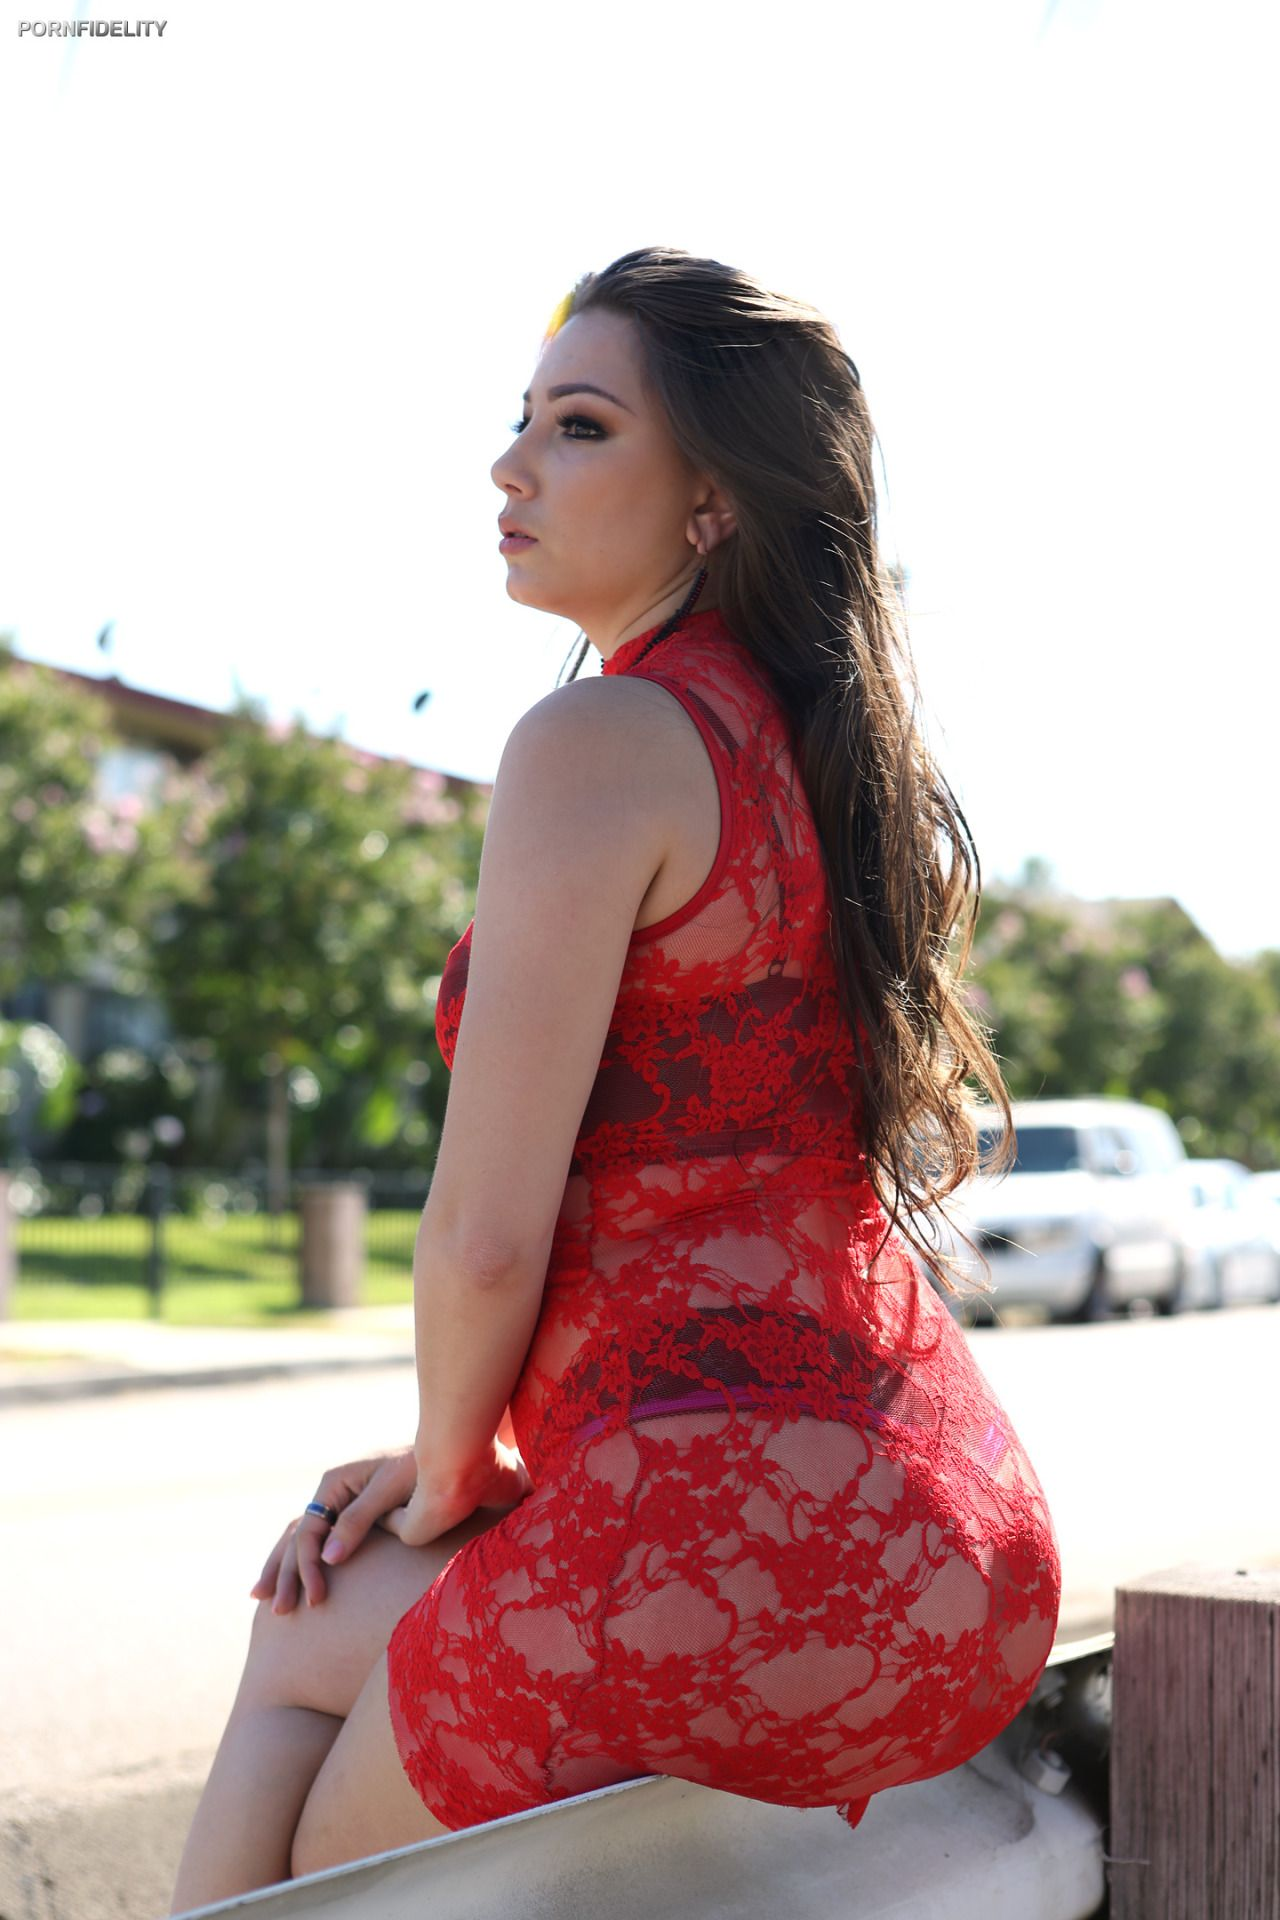 Sfwbutveryhot Alexis Rodriguez Aka Alyssa Gadson Check Out Her Blog Alyssagadson